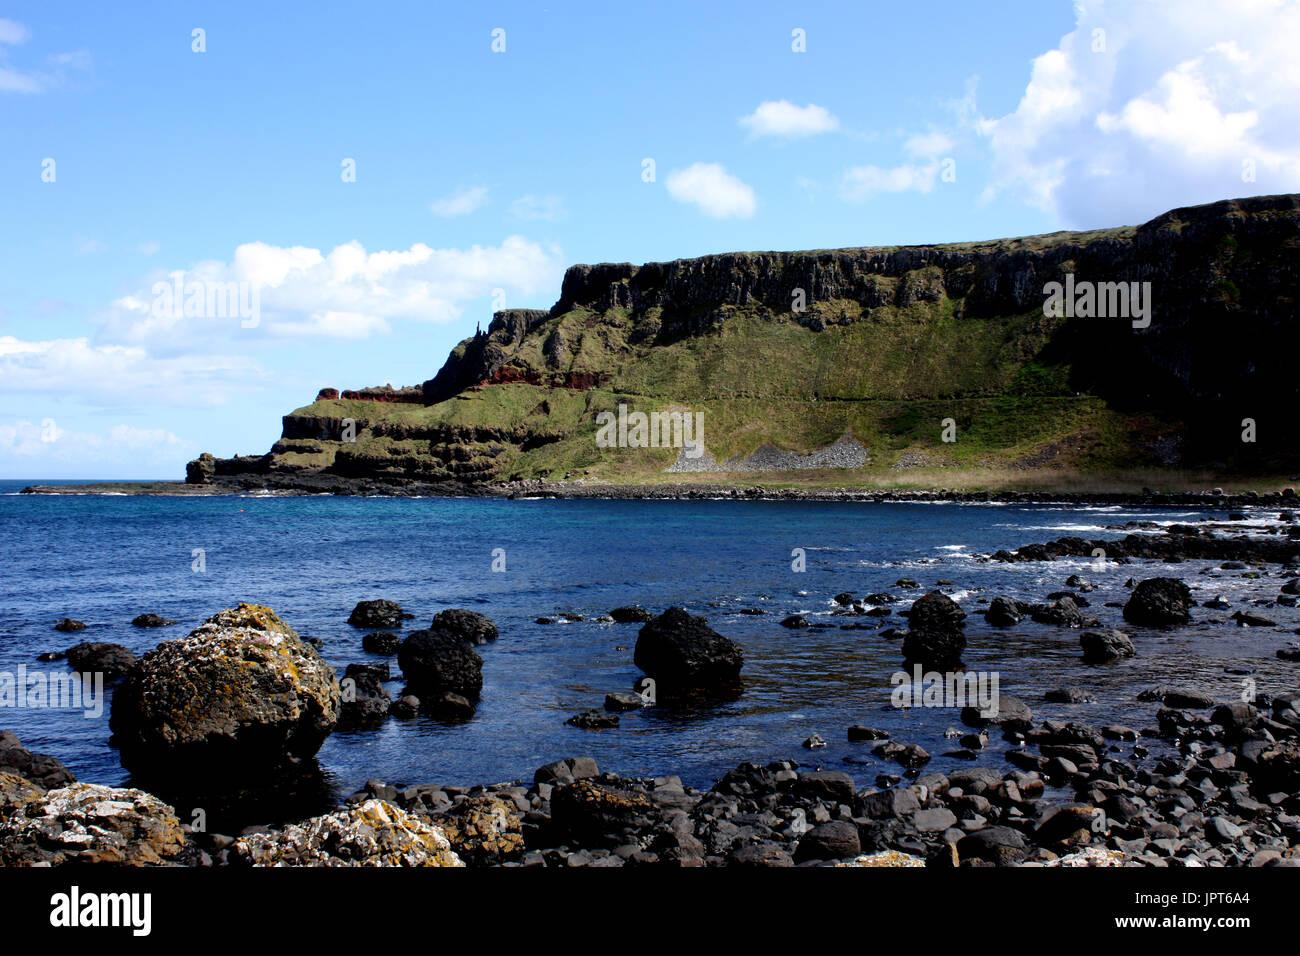 The Antrim Coast neat the Giant's Causeway - Stock Image